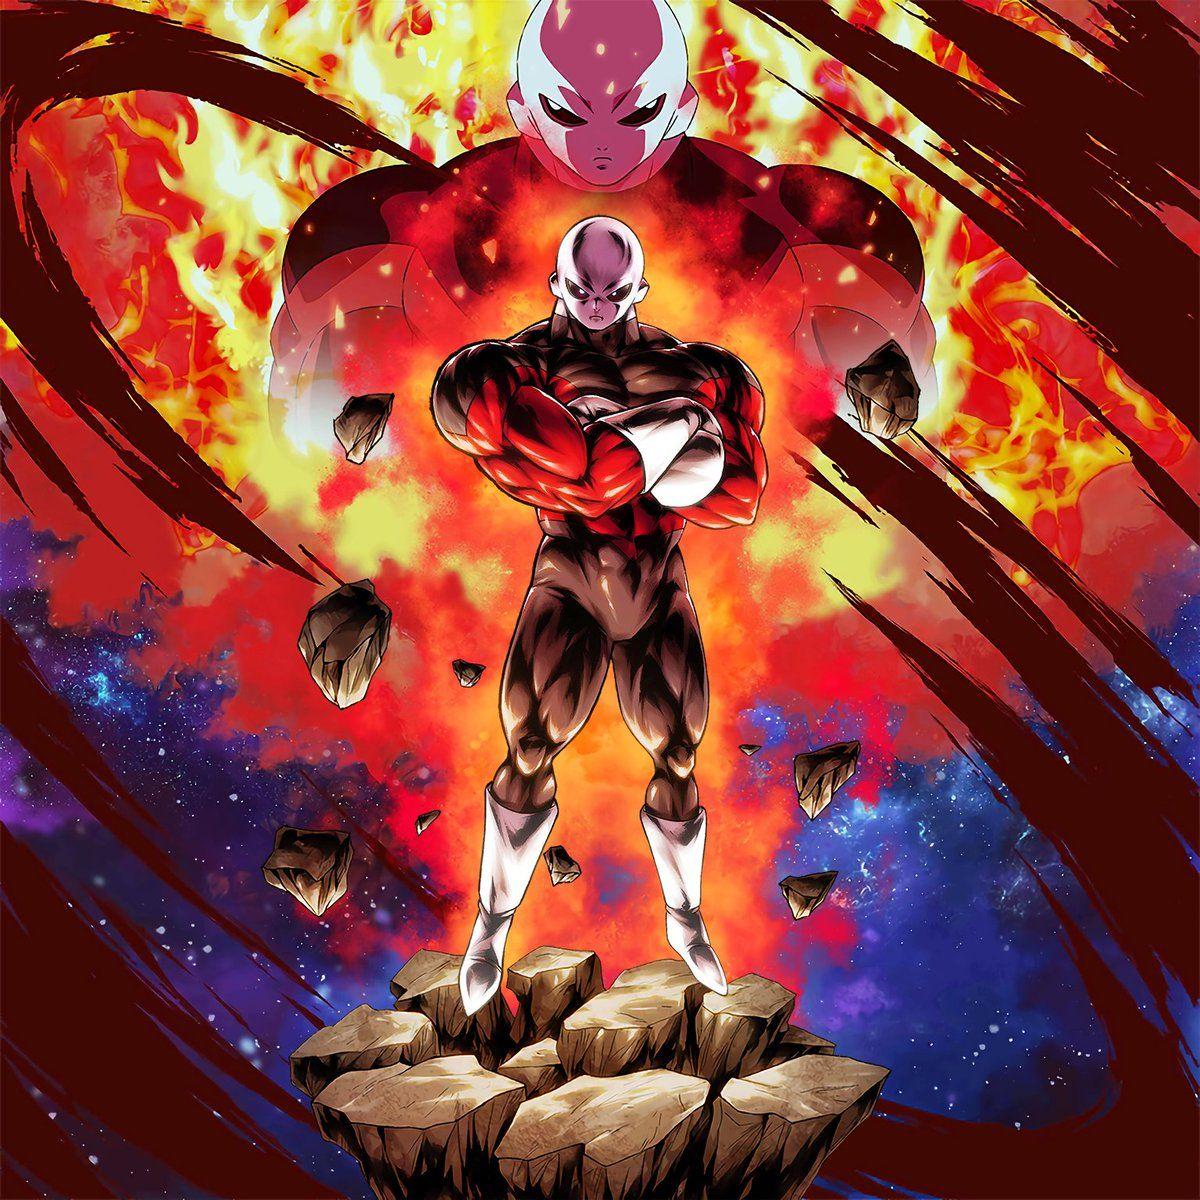 Maxiuchiha22 On Twitter In 2021 Dragon Ball Super Art Dragon Ball Super Artwork Anime Dragon Ball Super